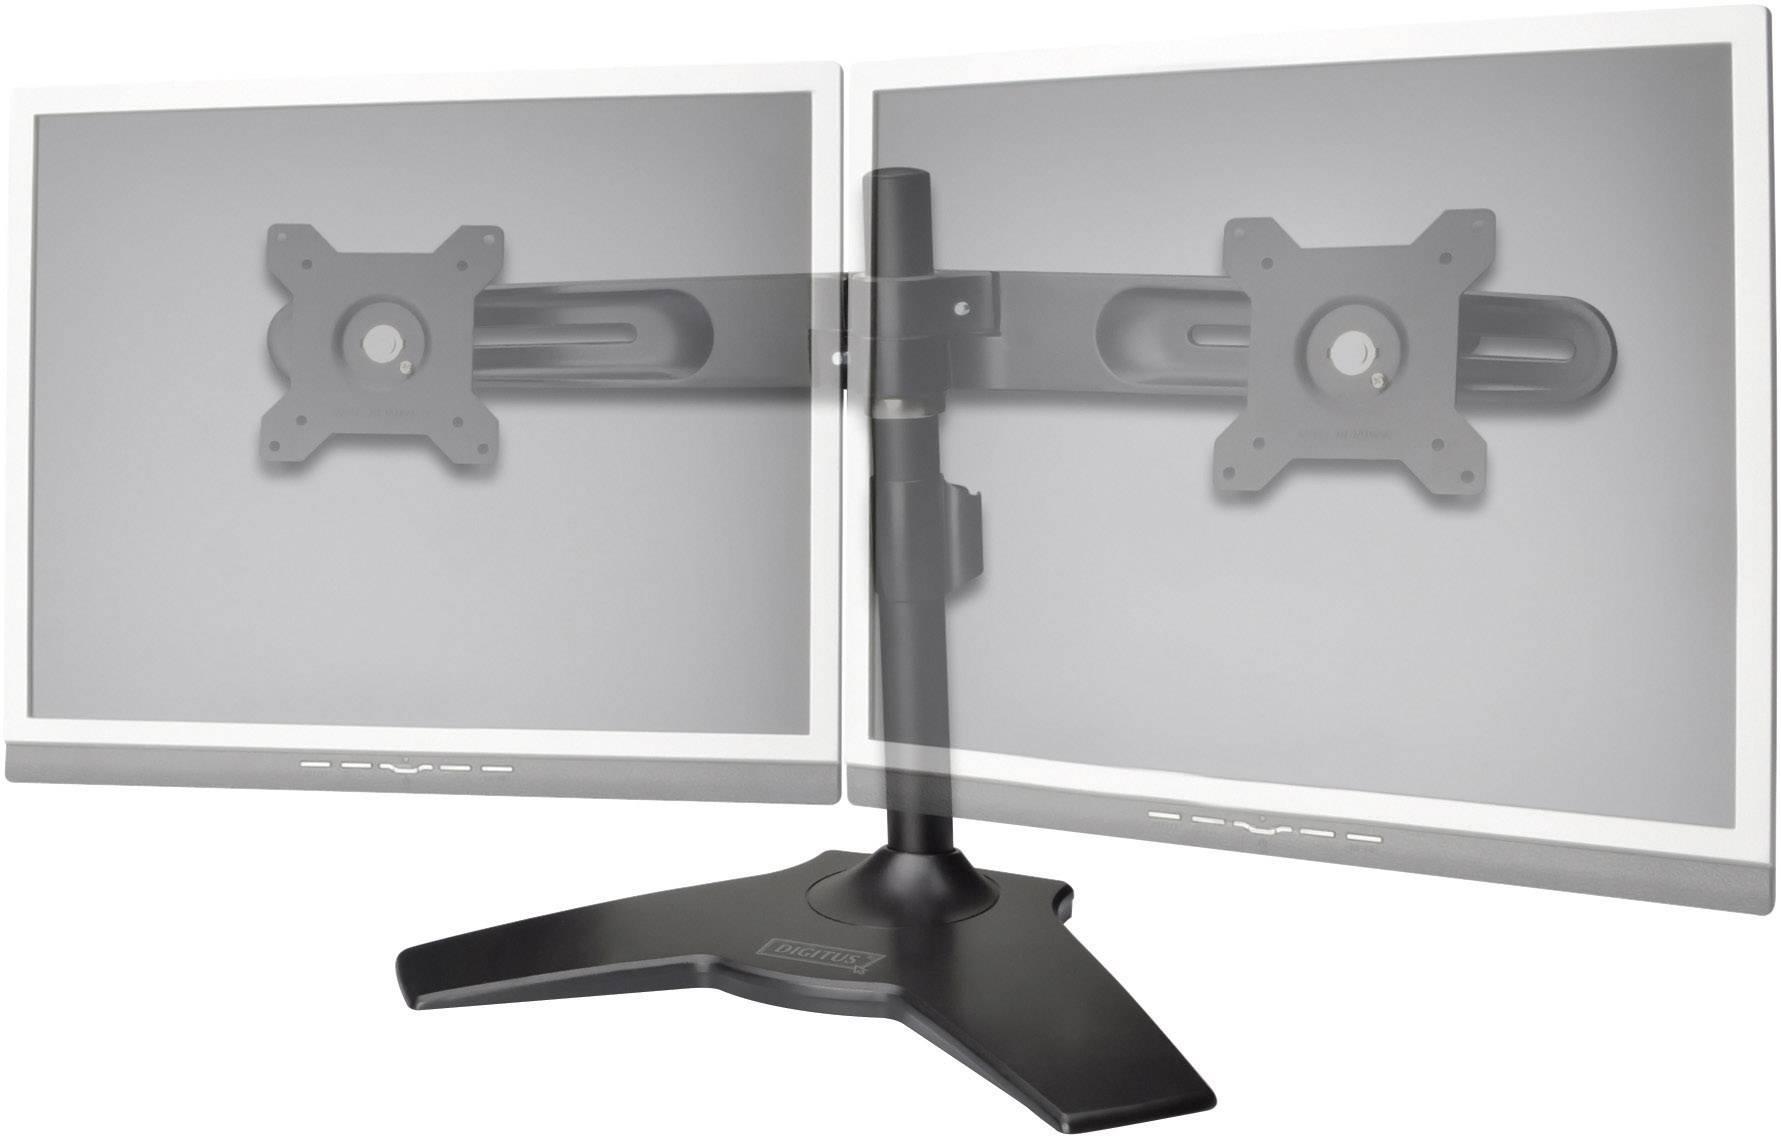 "Stojan na monitor Digitus DA-90322, 38,1 cm (15"") - 61,0 cm (24""), čierna"